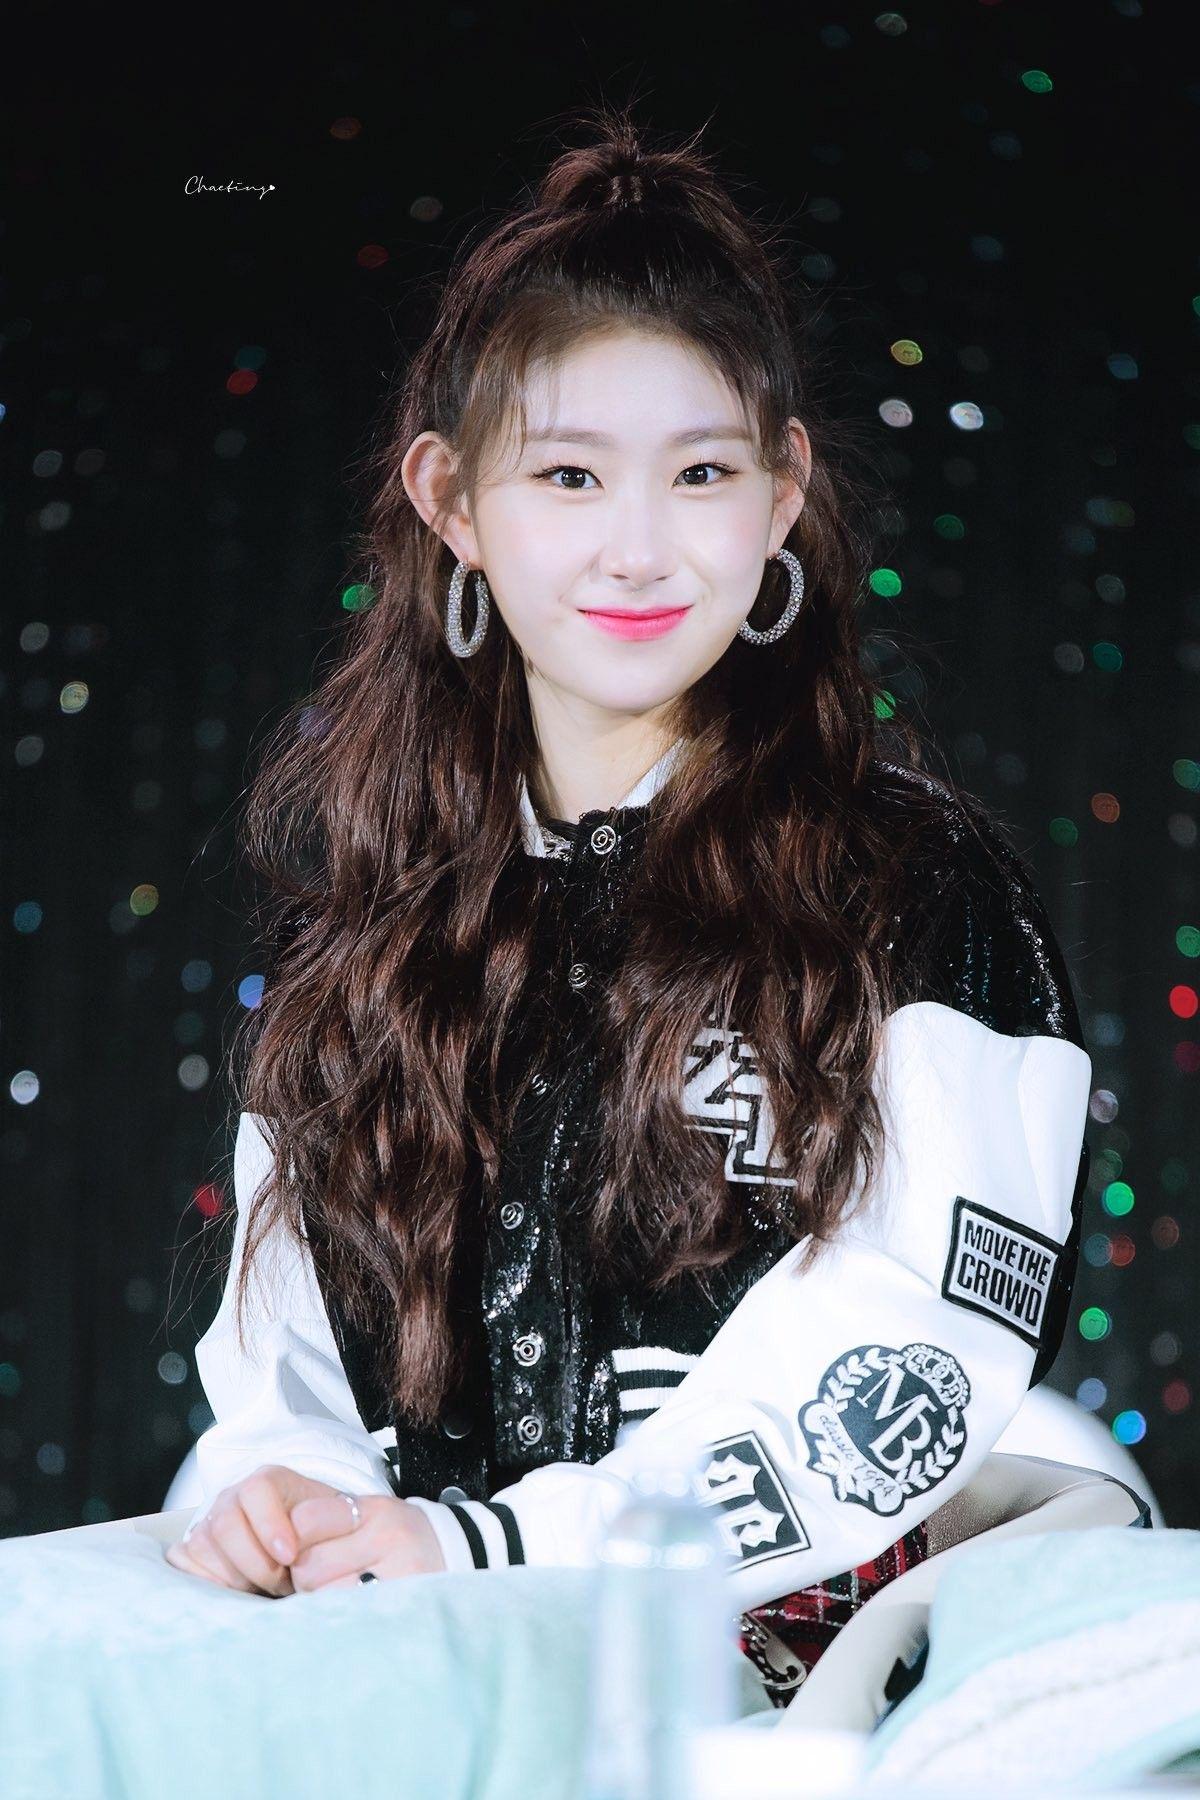 Itzy Chaeryeong 200218 Mbn Y Forum Itzy Kpop Girl Groups Kpop Girls